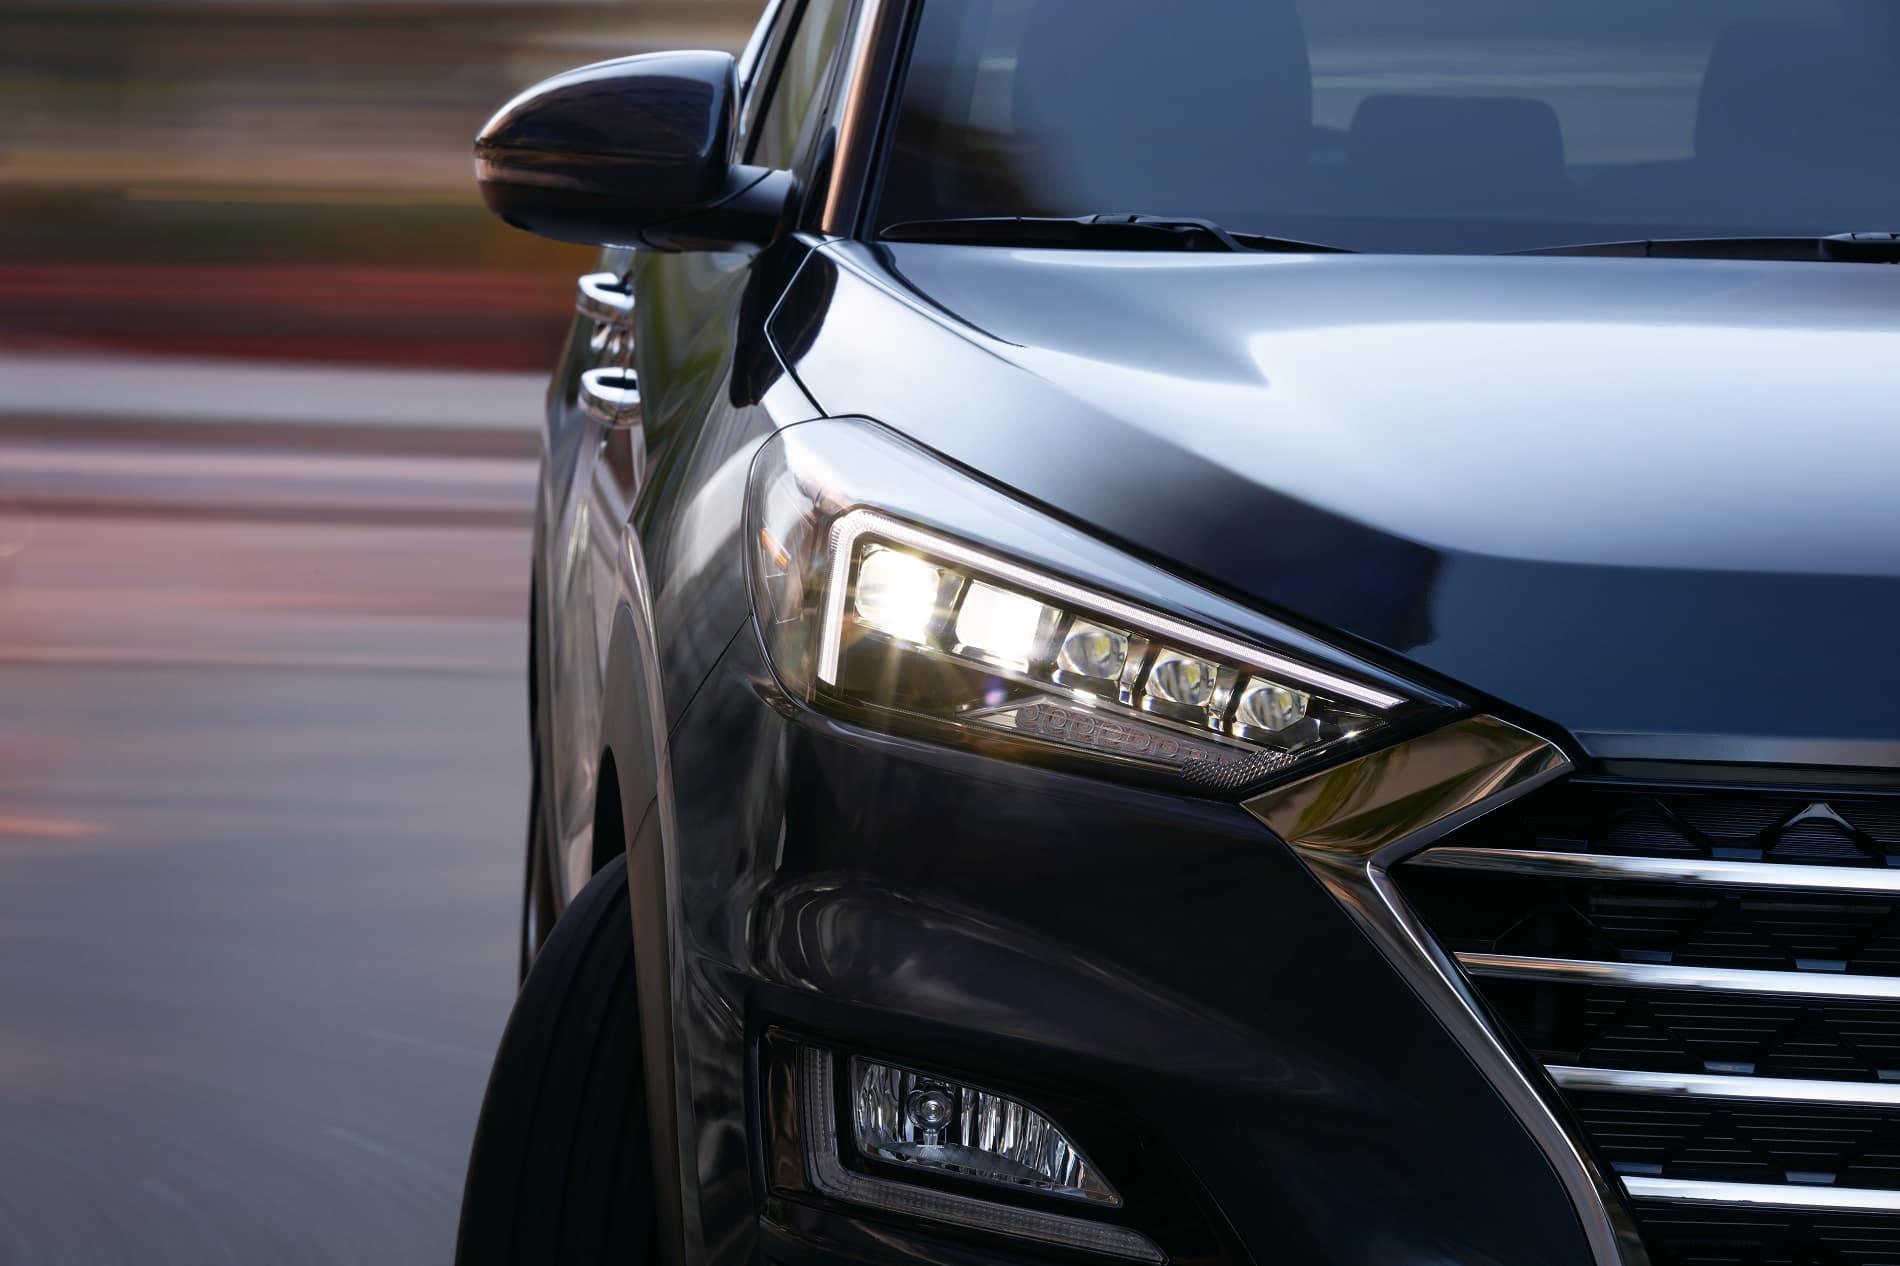 Hyundai Tucson vs Nissan Rogue